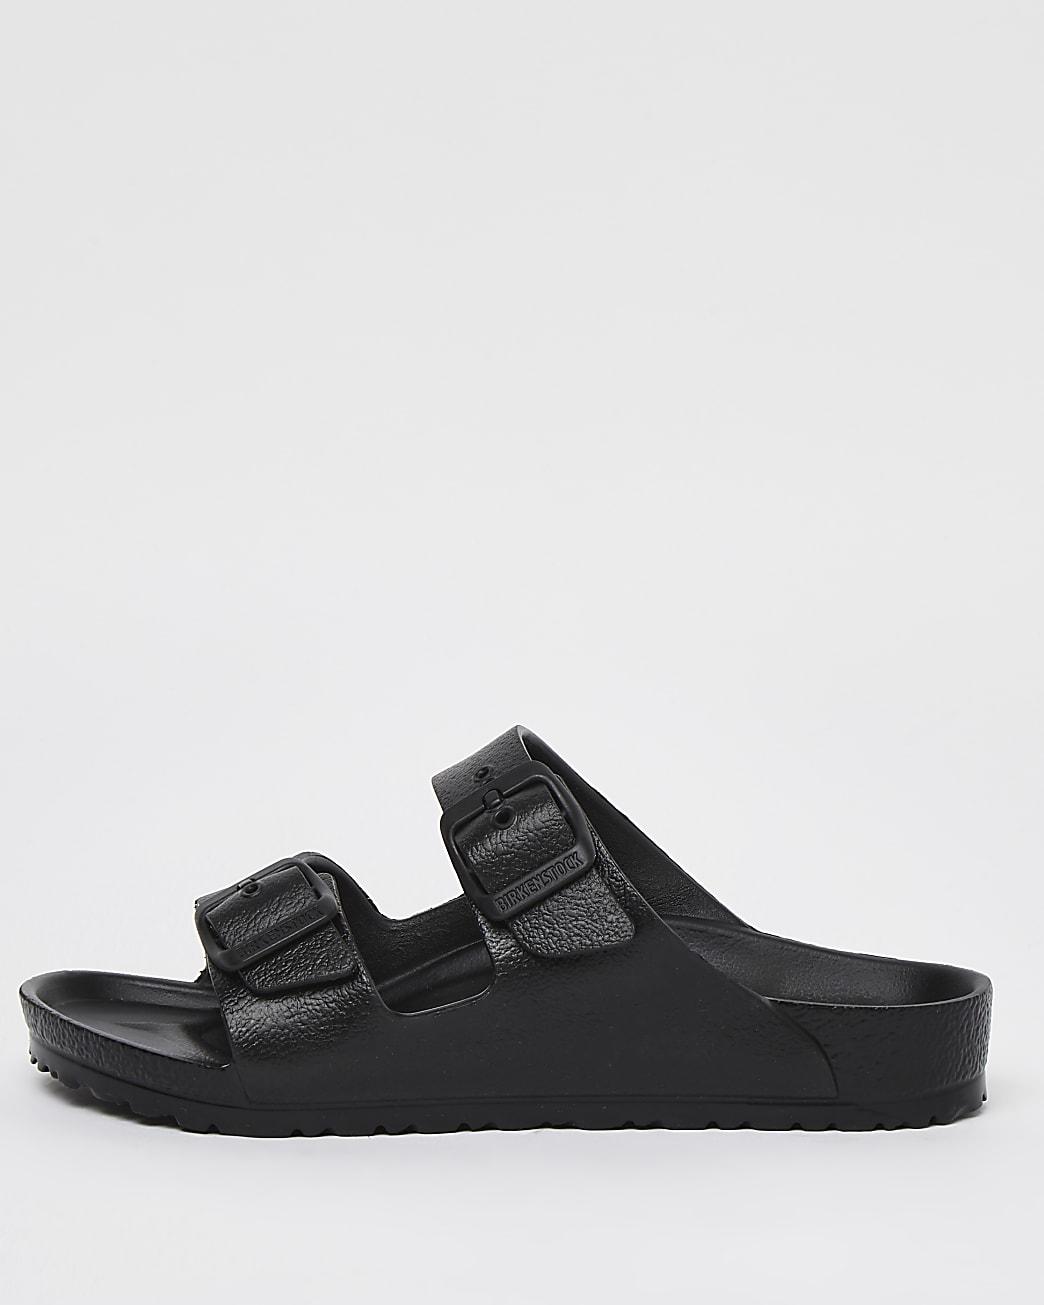 Girls black Birkenstock double strap sandals